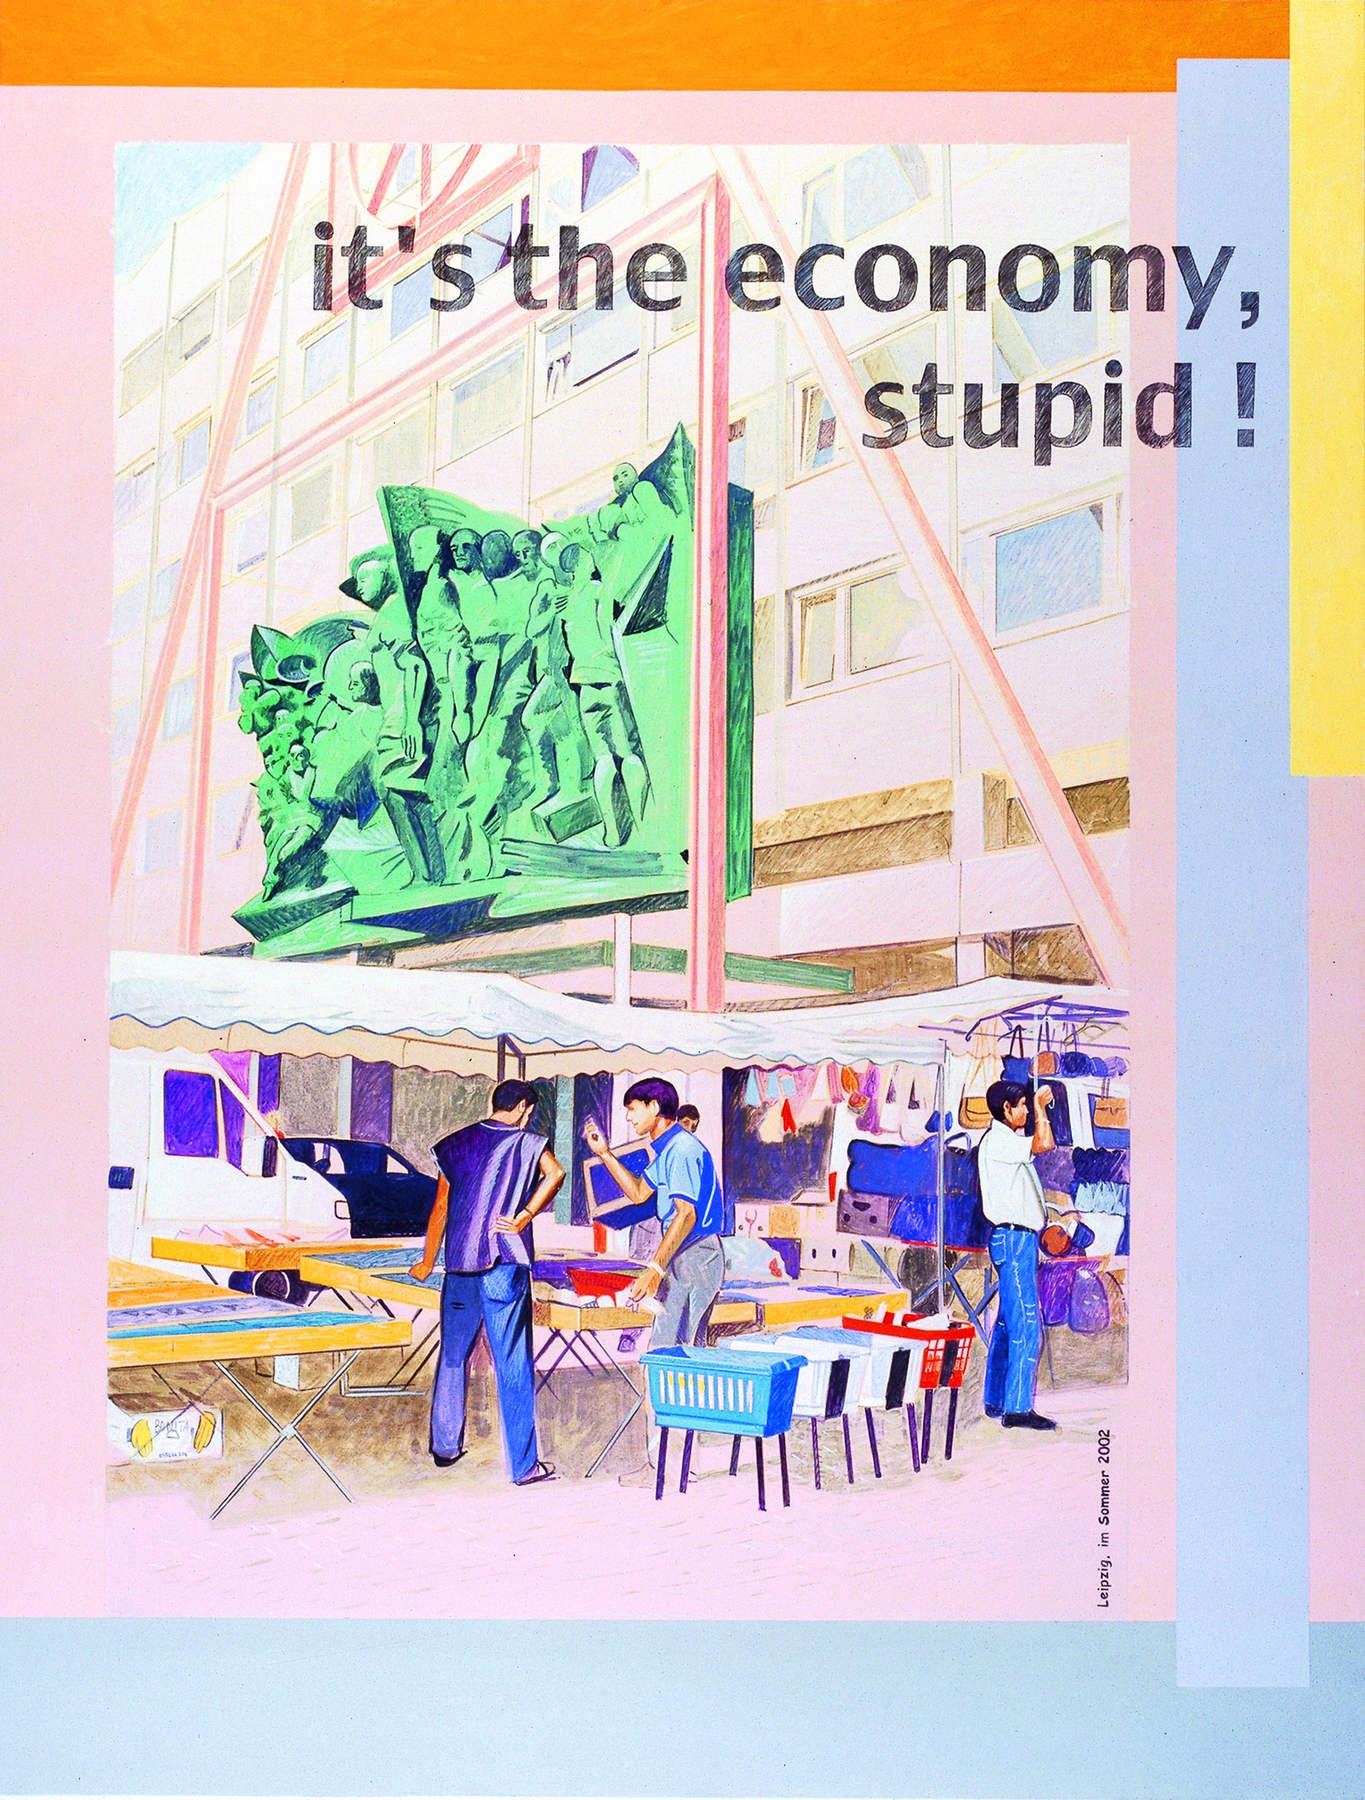 Johanna_Kandl__Economy